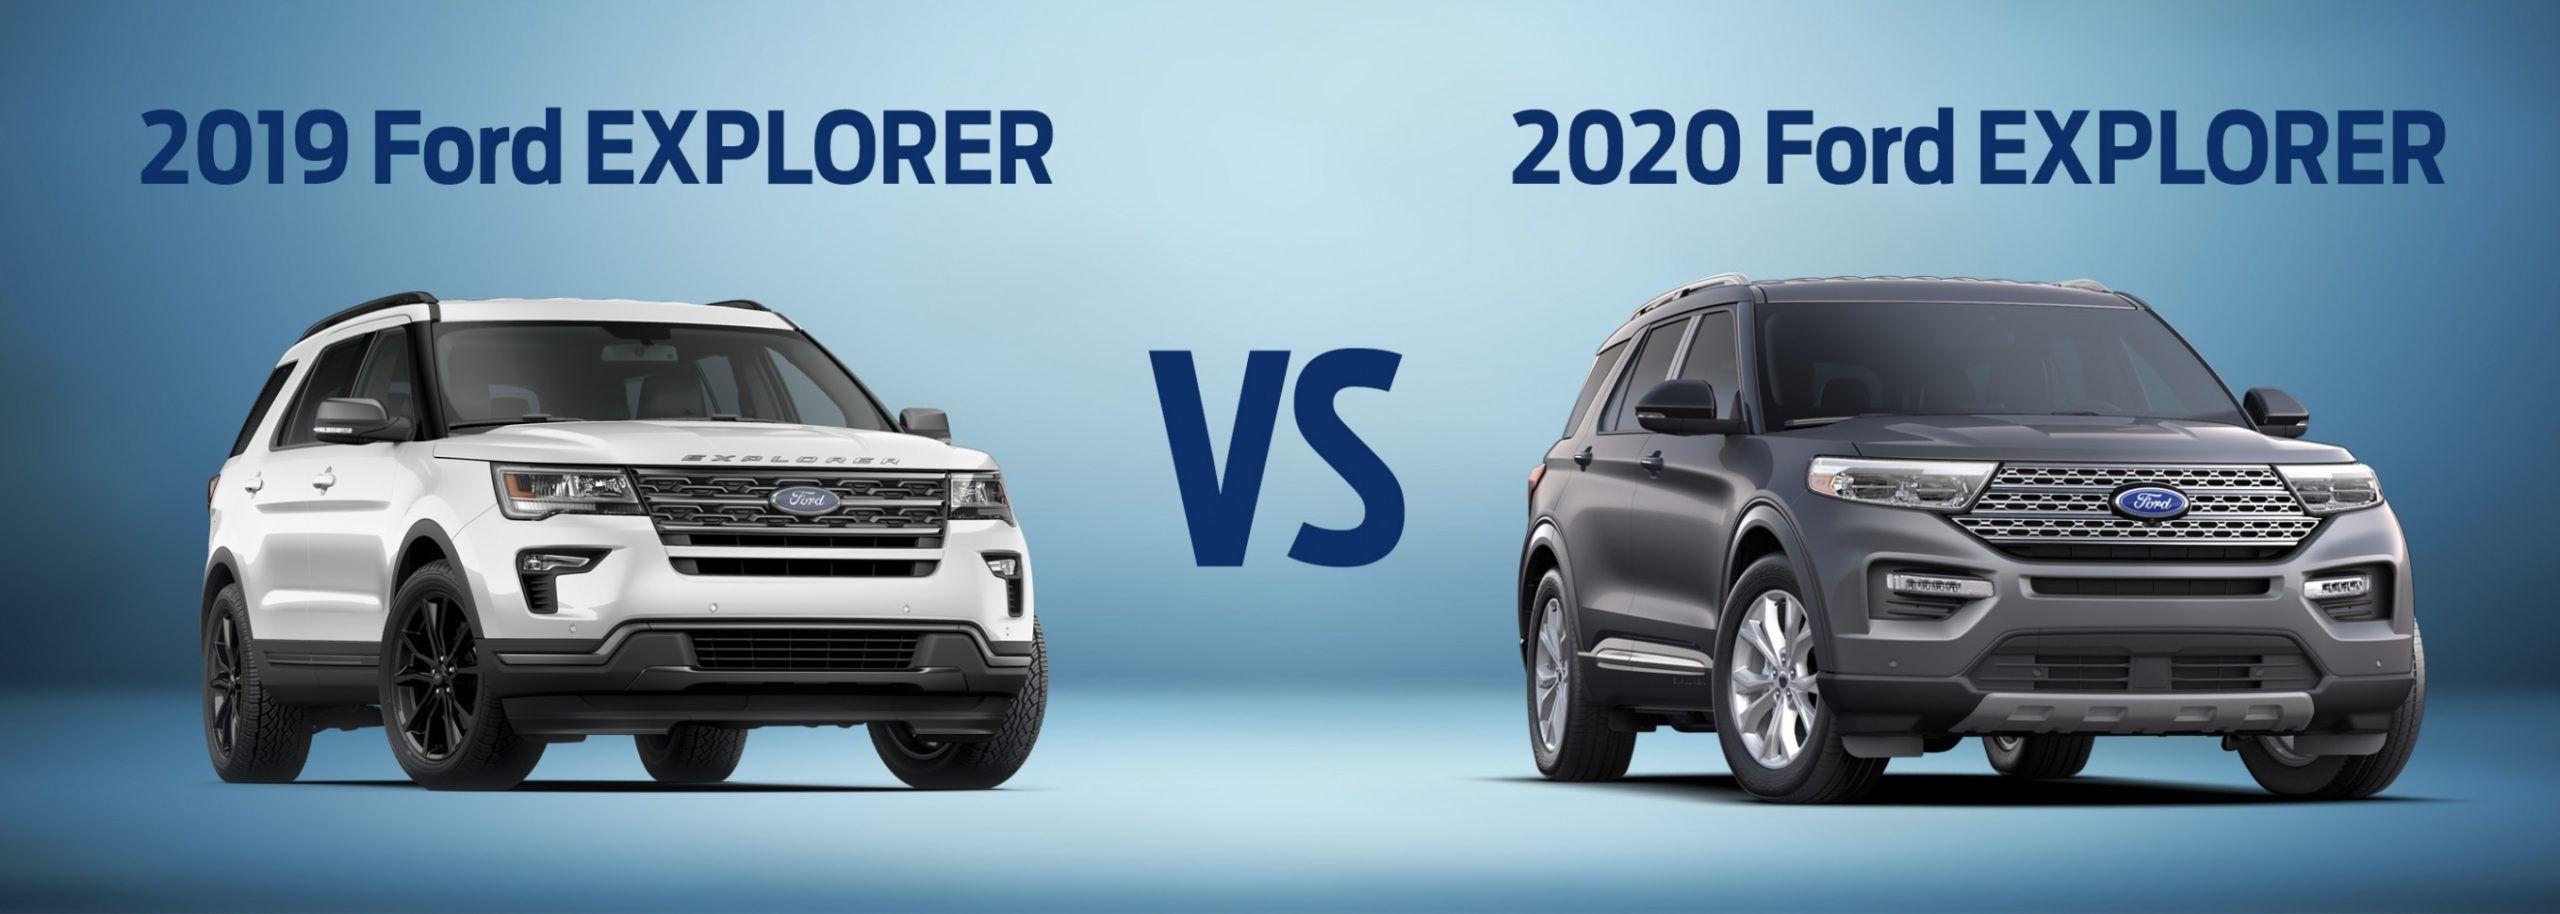 Is Ford Xlt Sport Package 2020 Design Still (Dengan gambar)